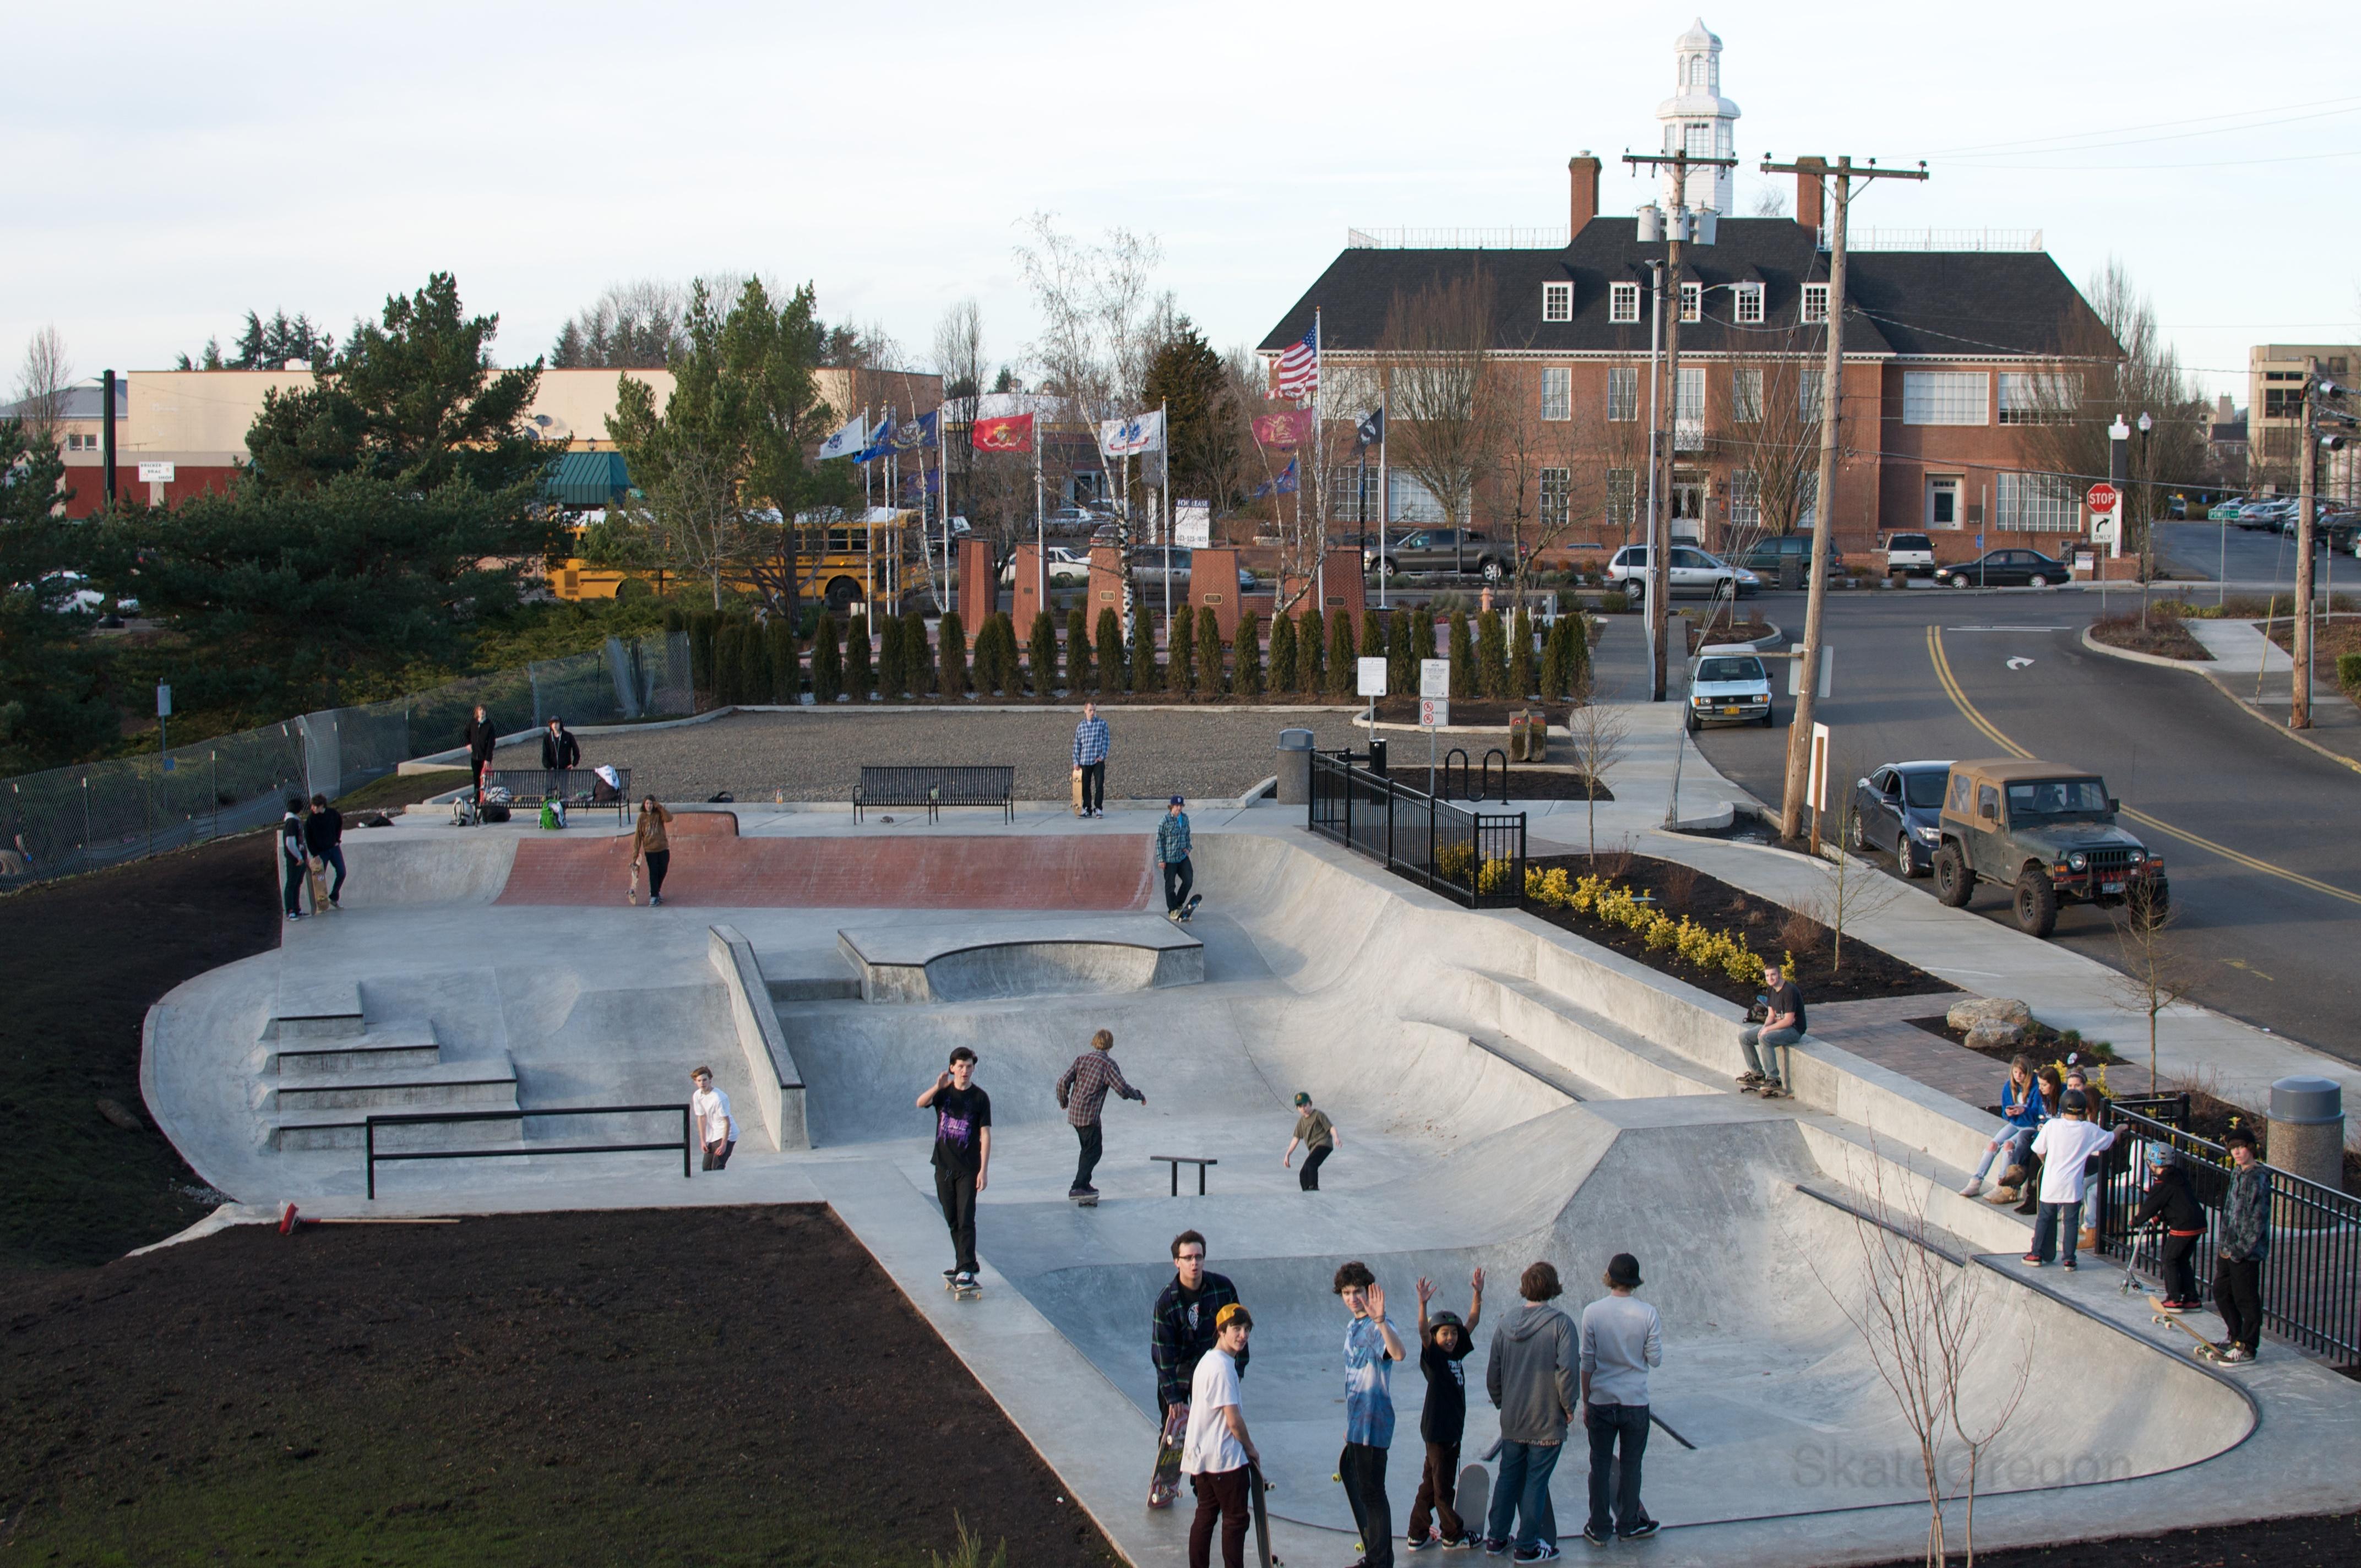 File:SkatePark in Main City Park, Gresham, Oregon.jpg ...